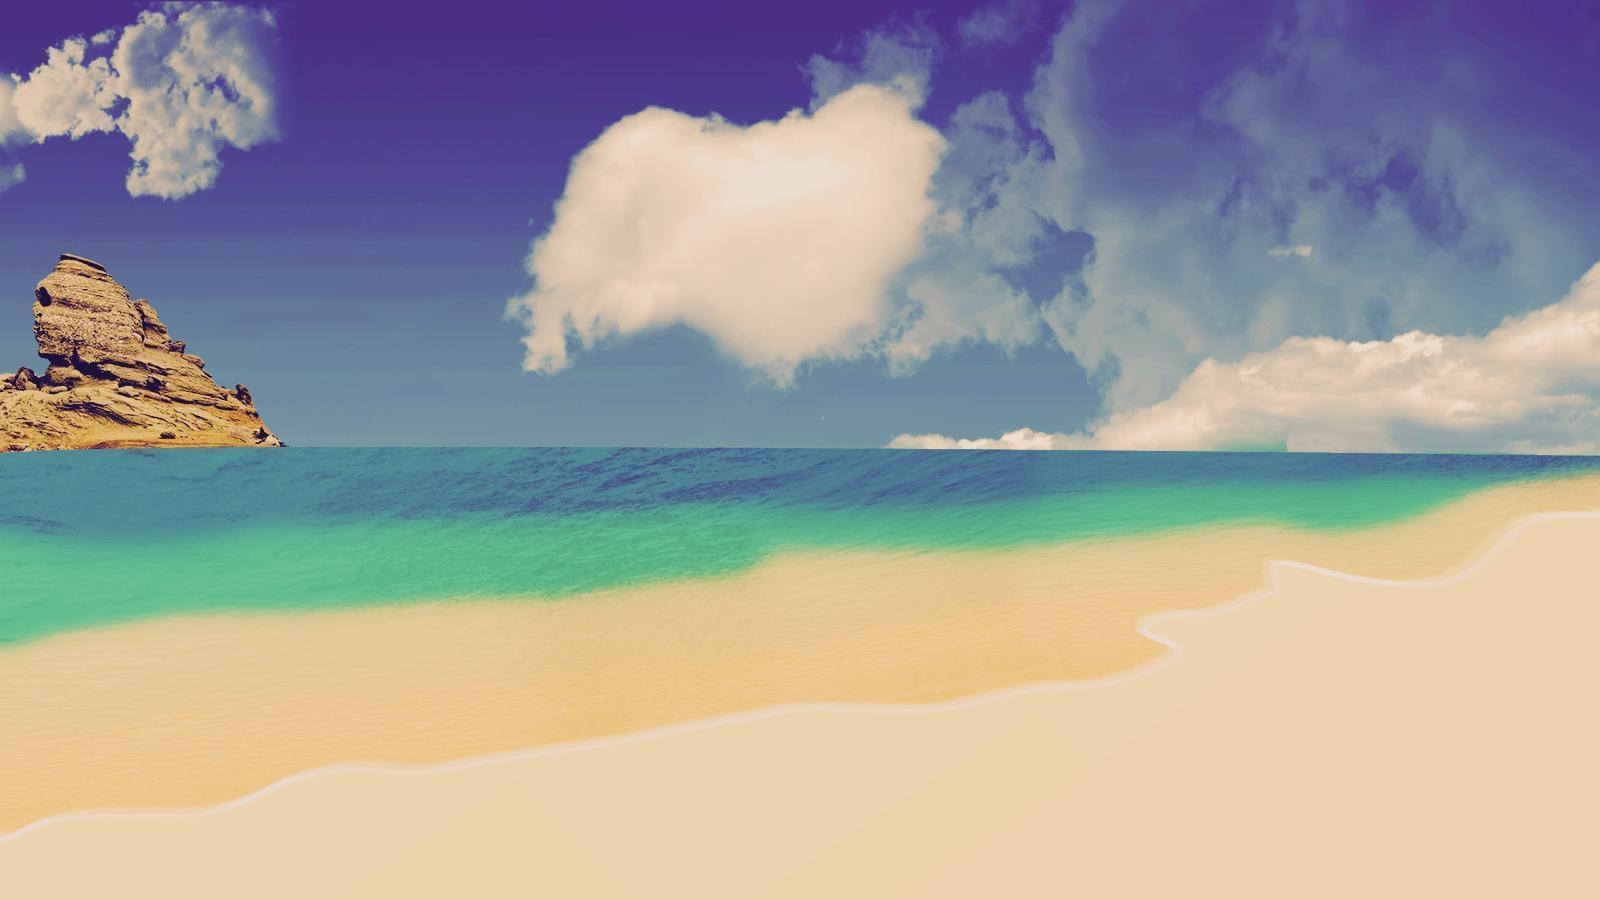 Backgrounds Summer 1600x900